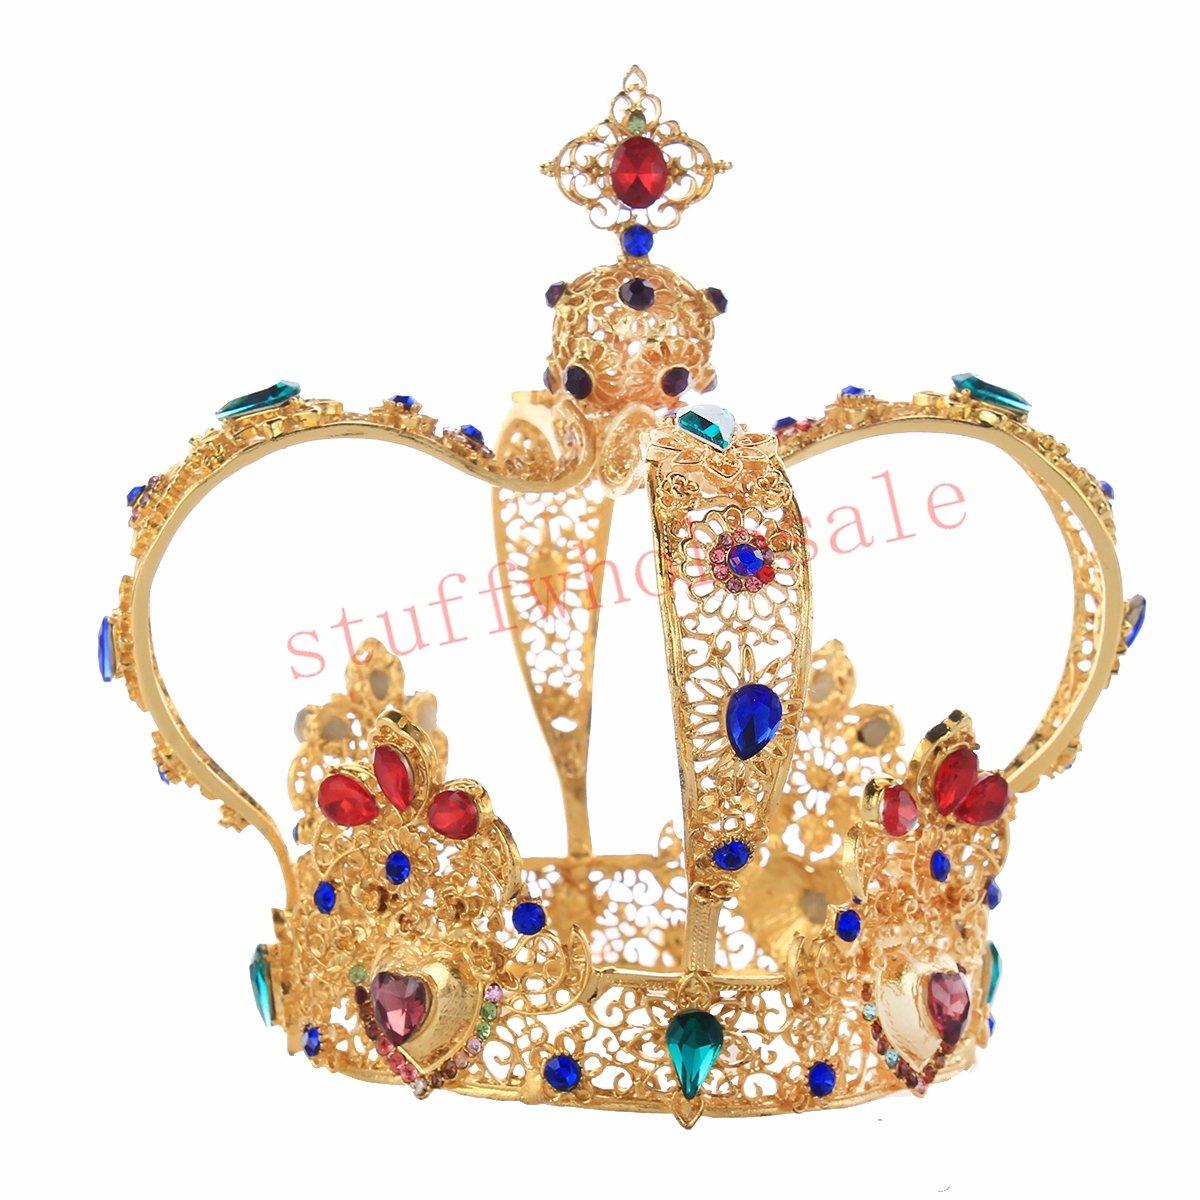 Stuffwholesale 5.5inch Gold Queen Tiara Mini Bun Tiara Wedding Party Crown